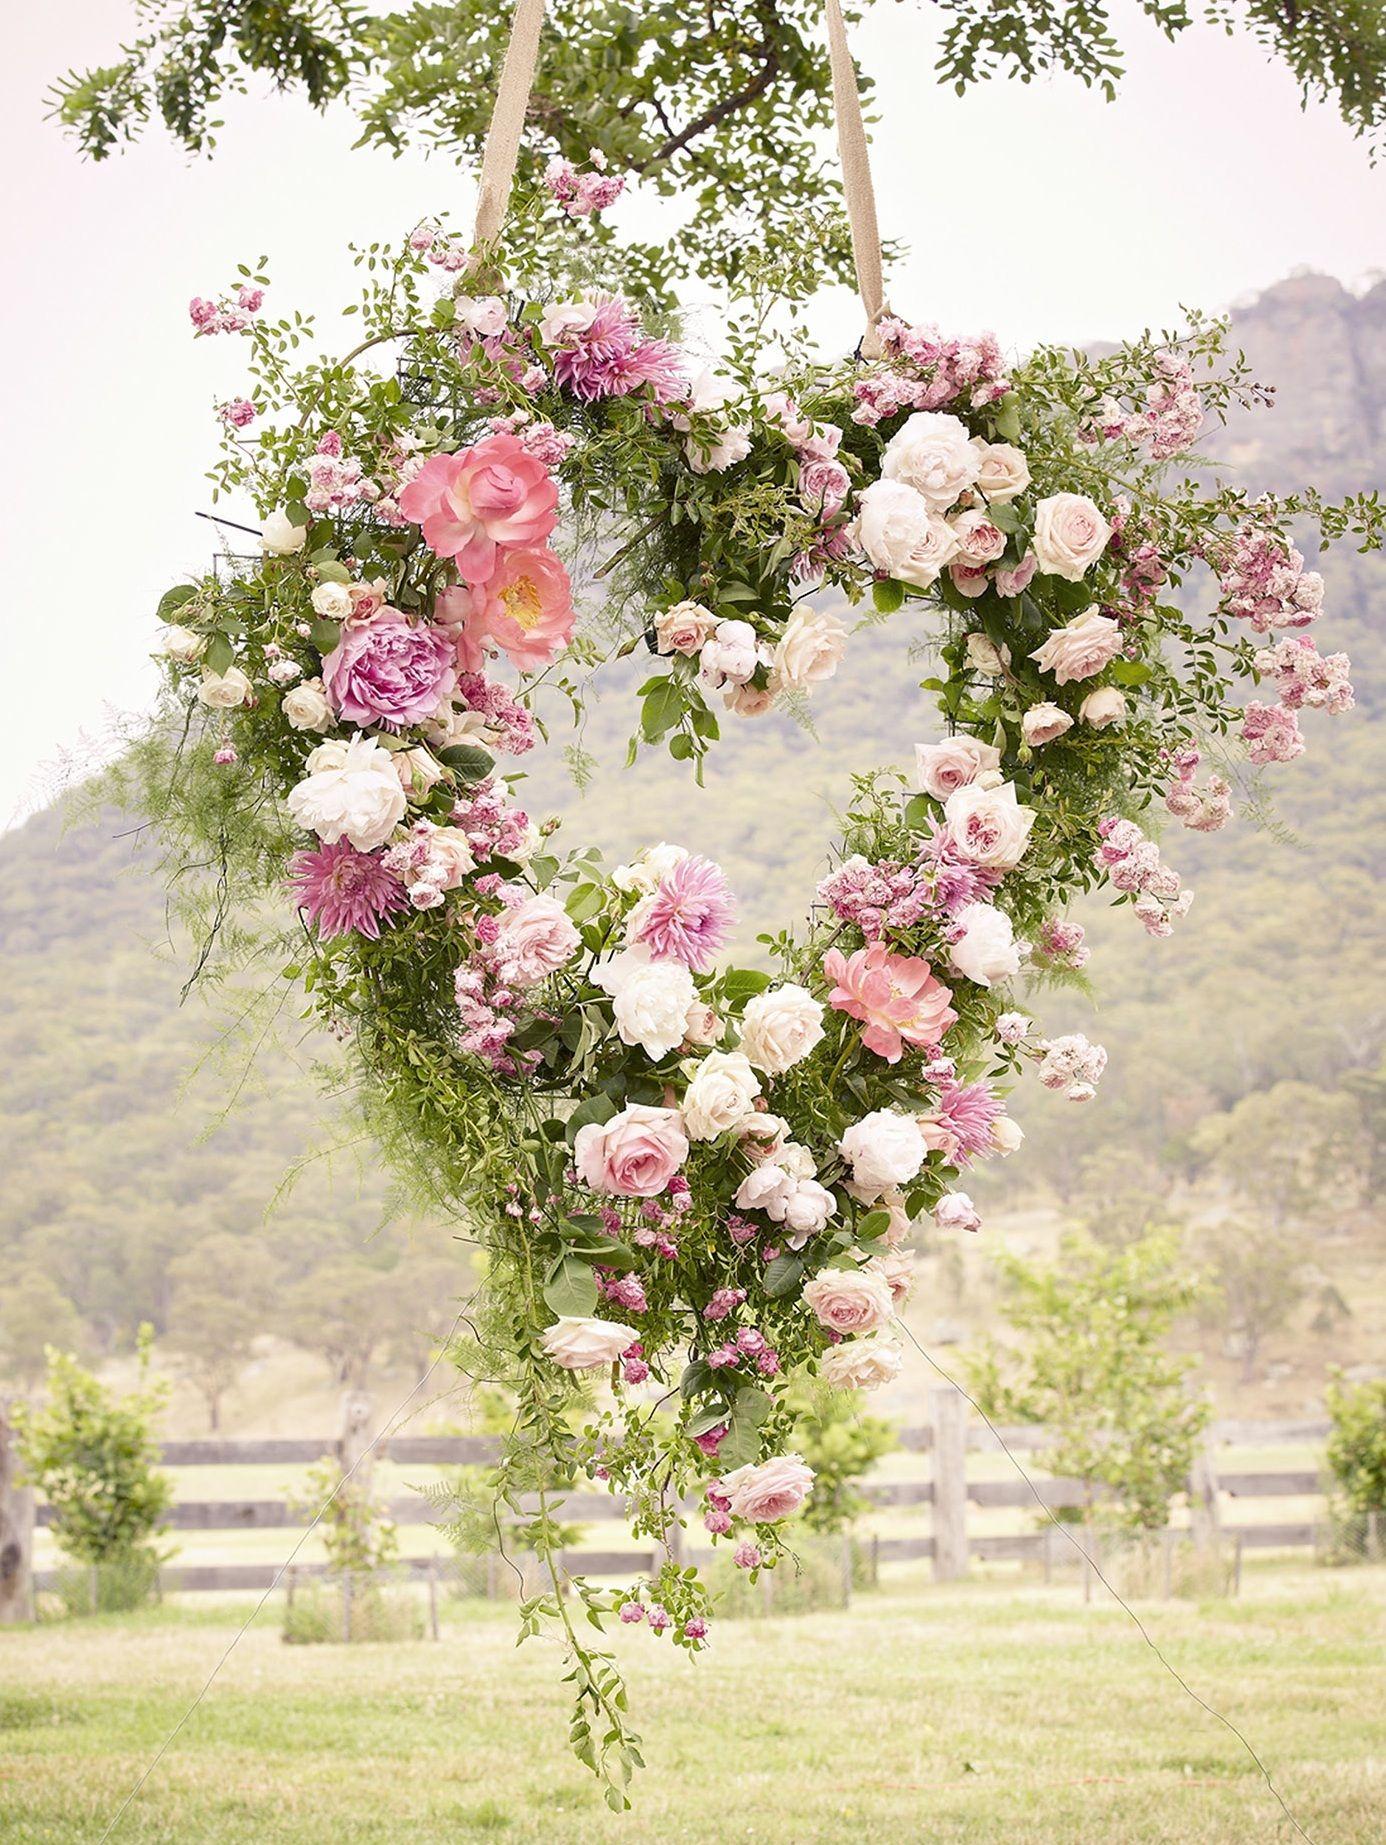 40 Heart Shape Wedding Ideas